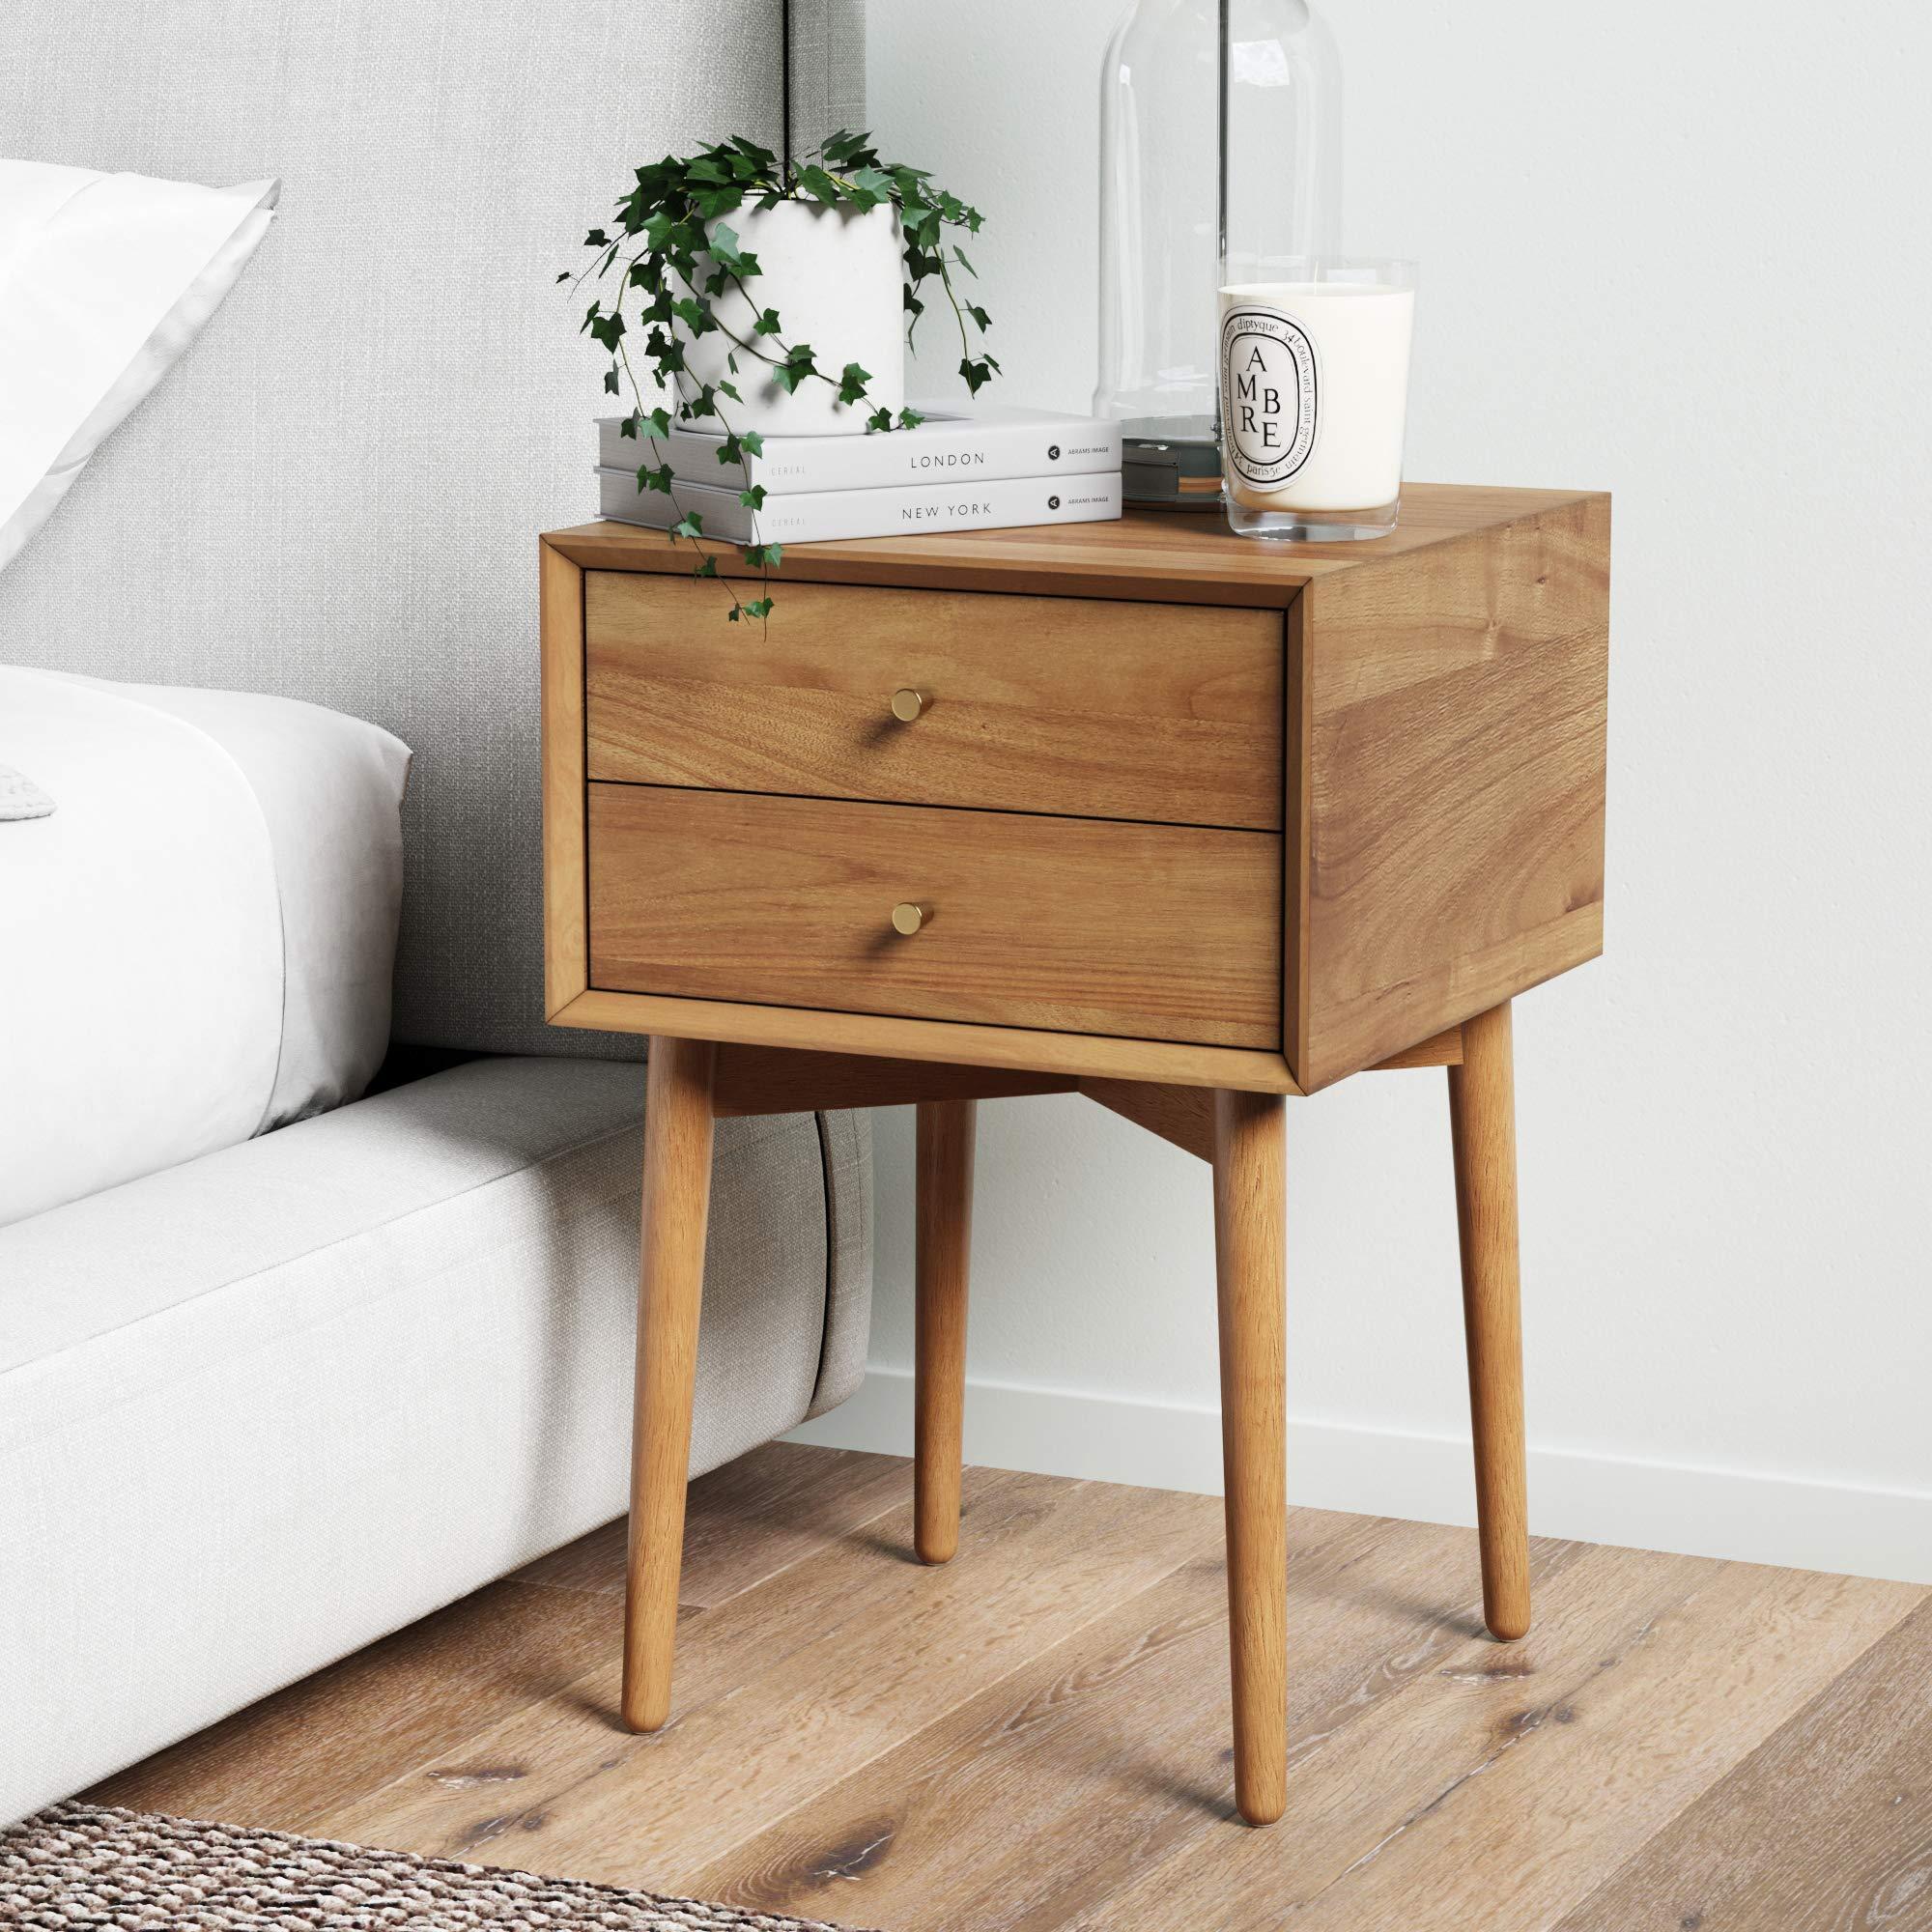 MILAAU Scandinavian side table Mid century cabinet Oak nightstand LILU Wood end table